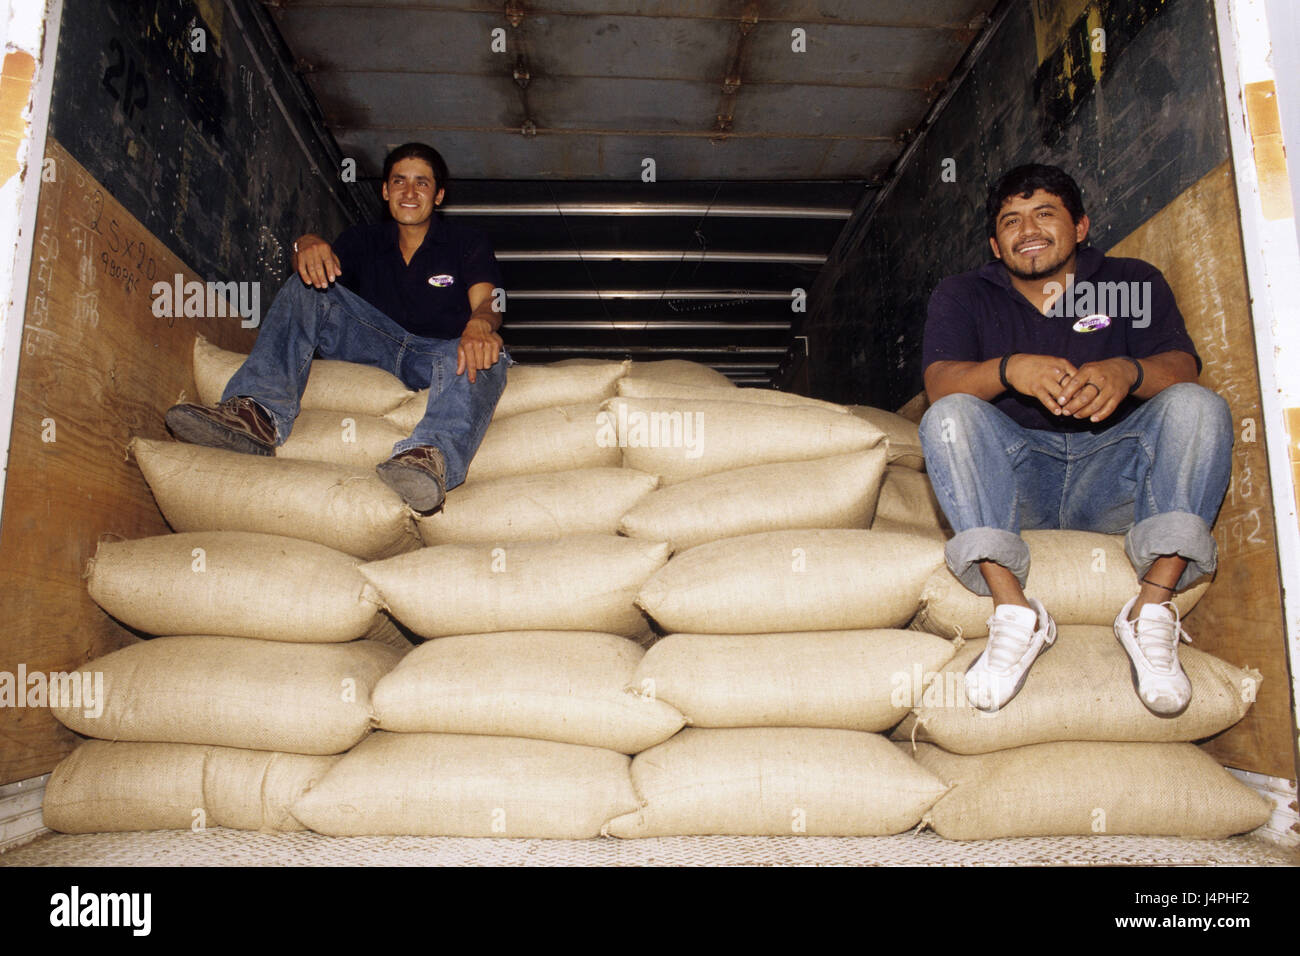 Costa Rica, San Isidro de tablespoons general, men, truck, coffee bags, - Stock Image